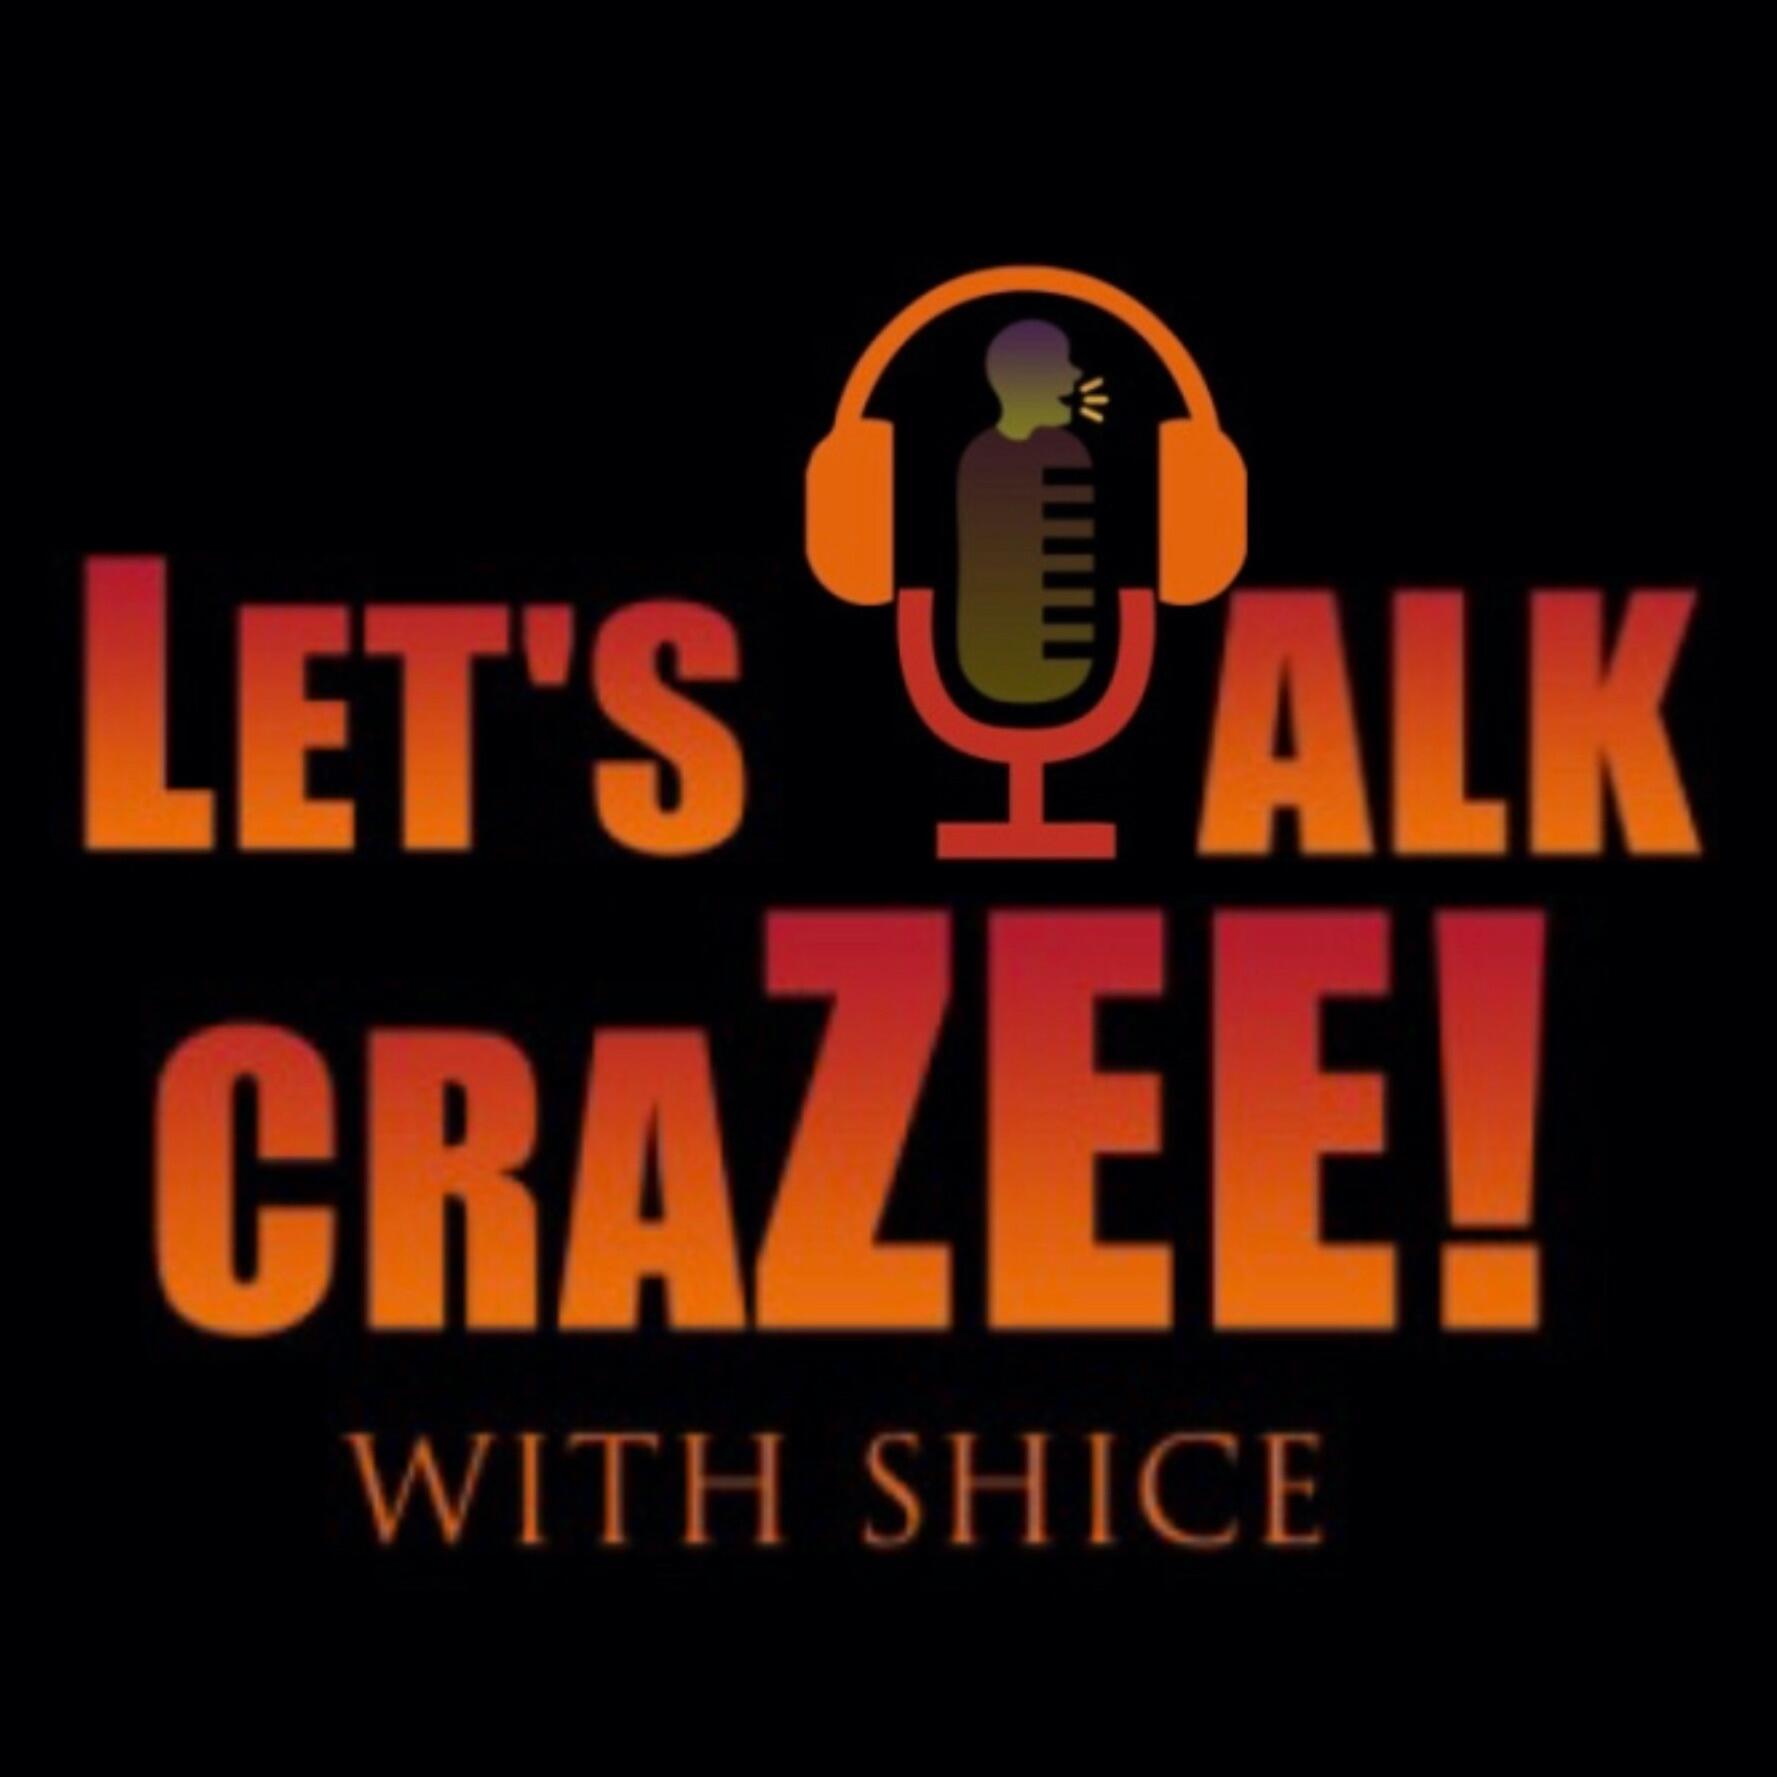 Let's Talk CraZee Podcast